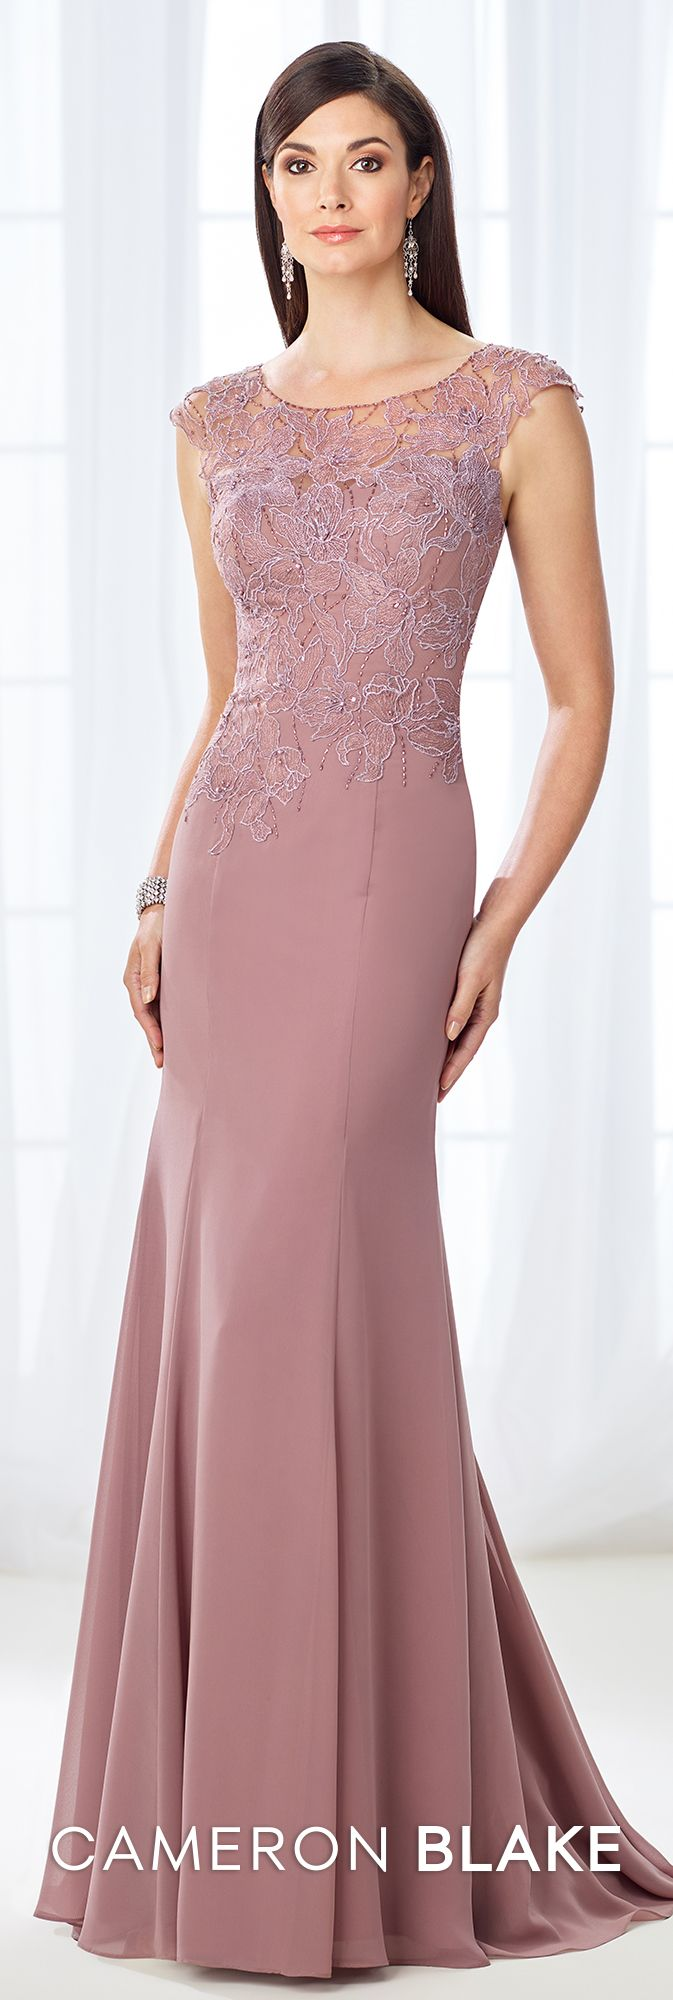 Cameron Blake - Evening Dresses - 118667 | Vestidos madre del novio ...